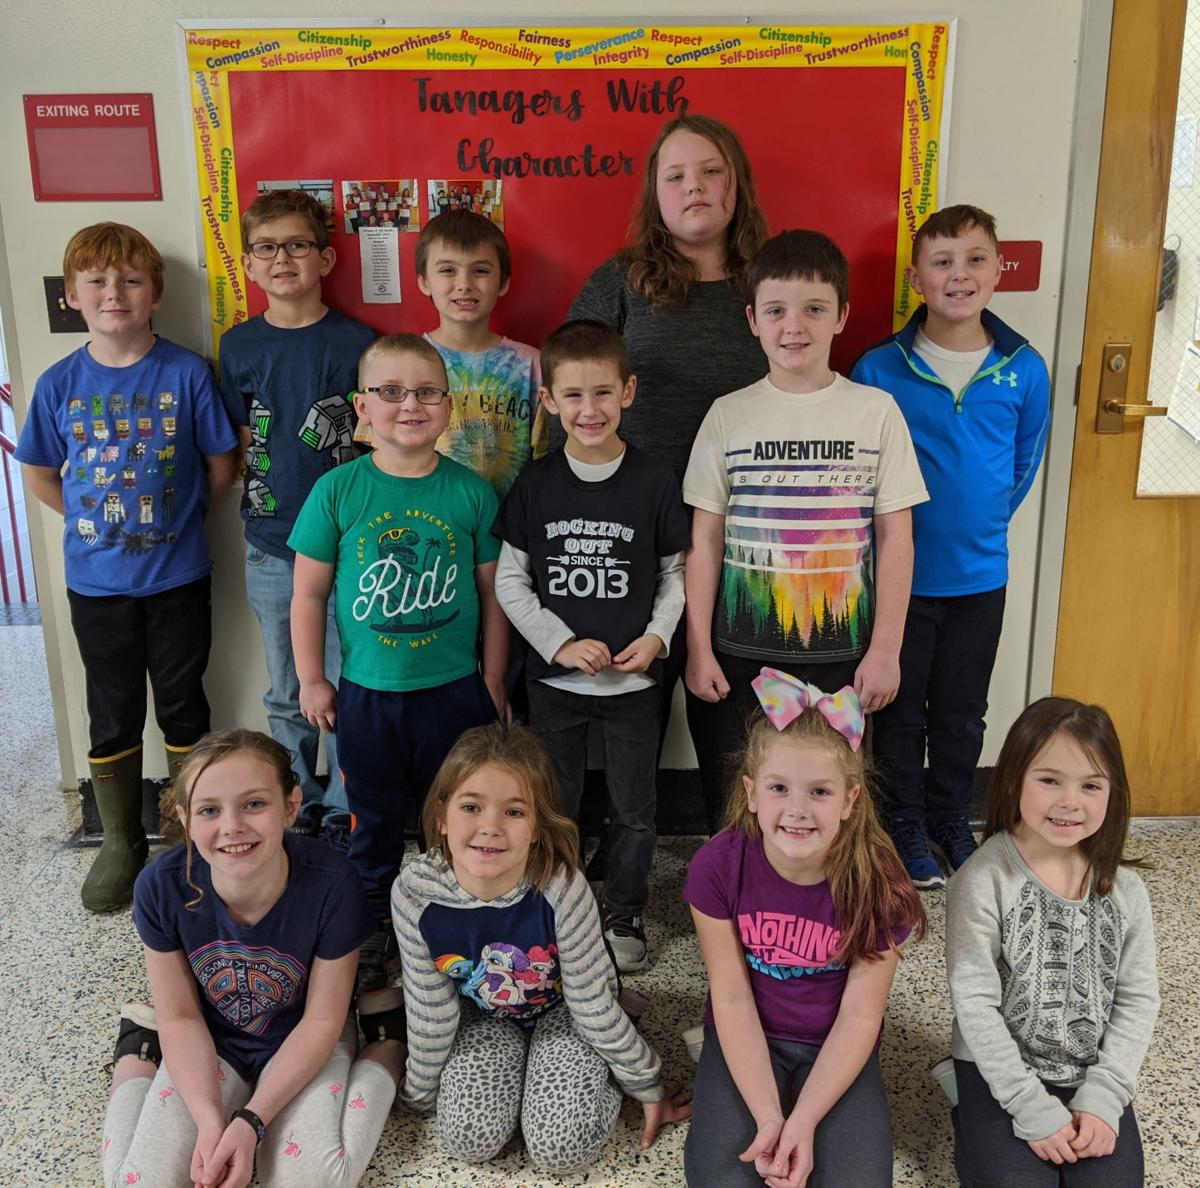 Hartford students show citizenship